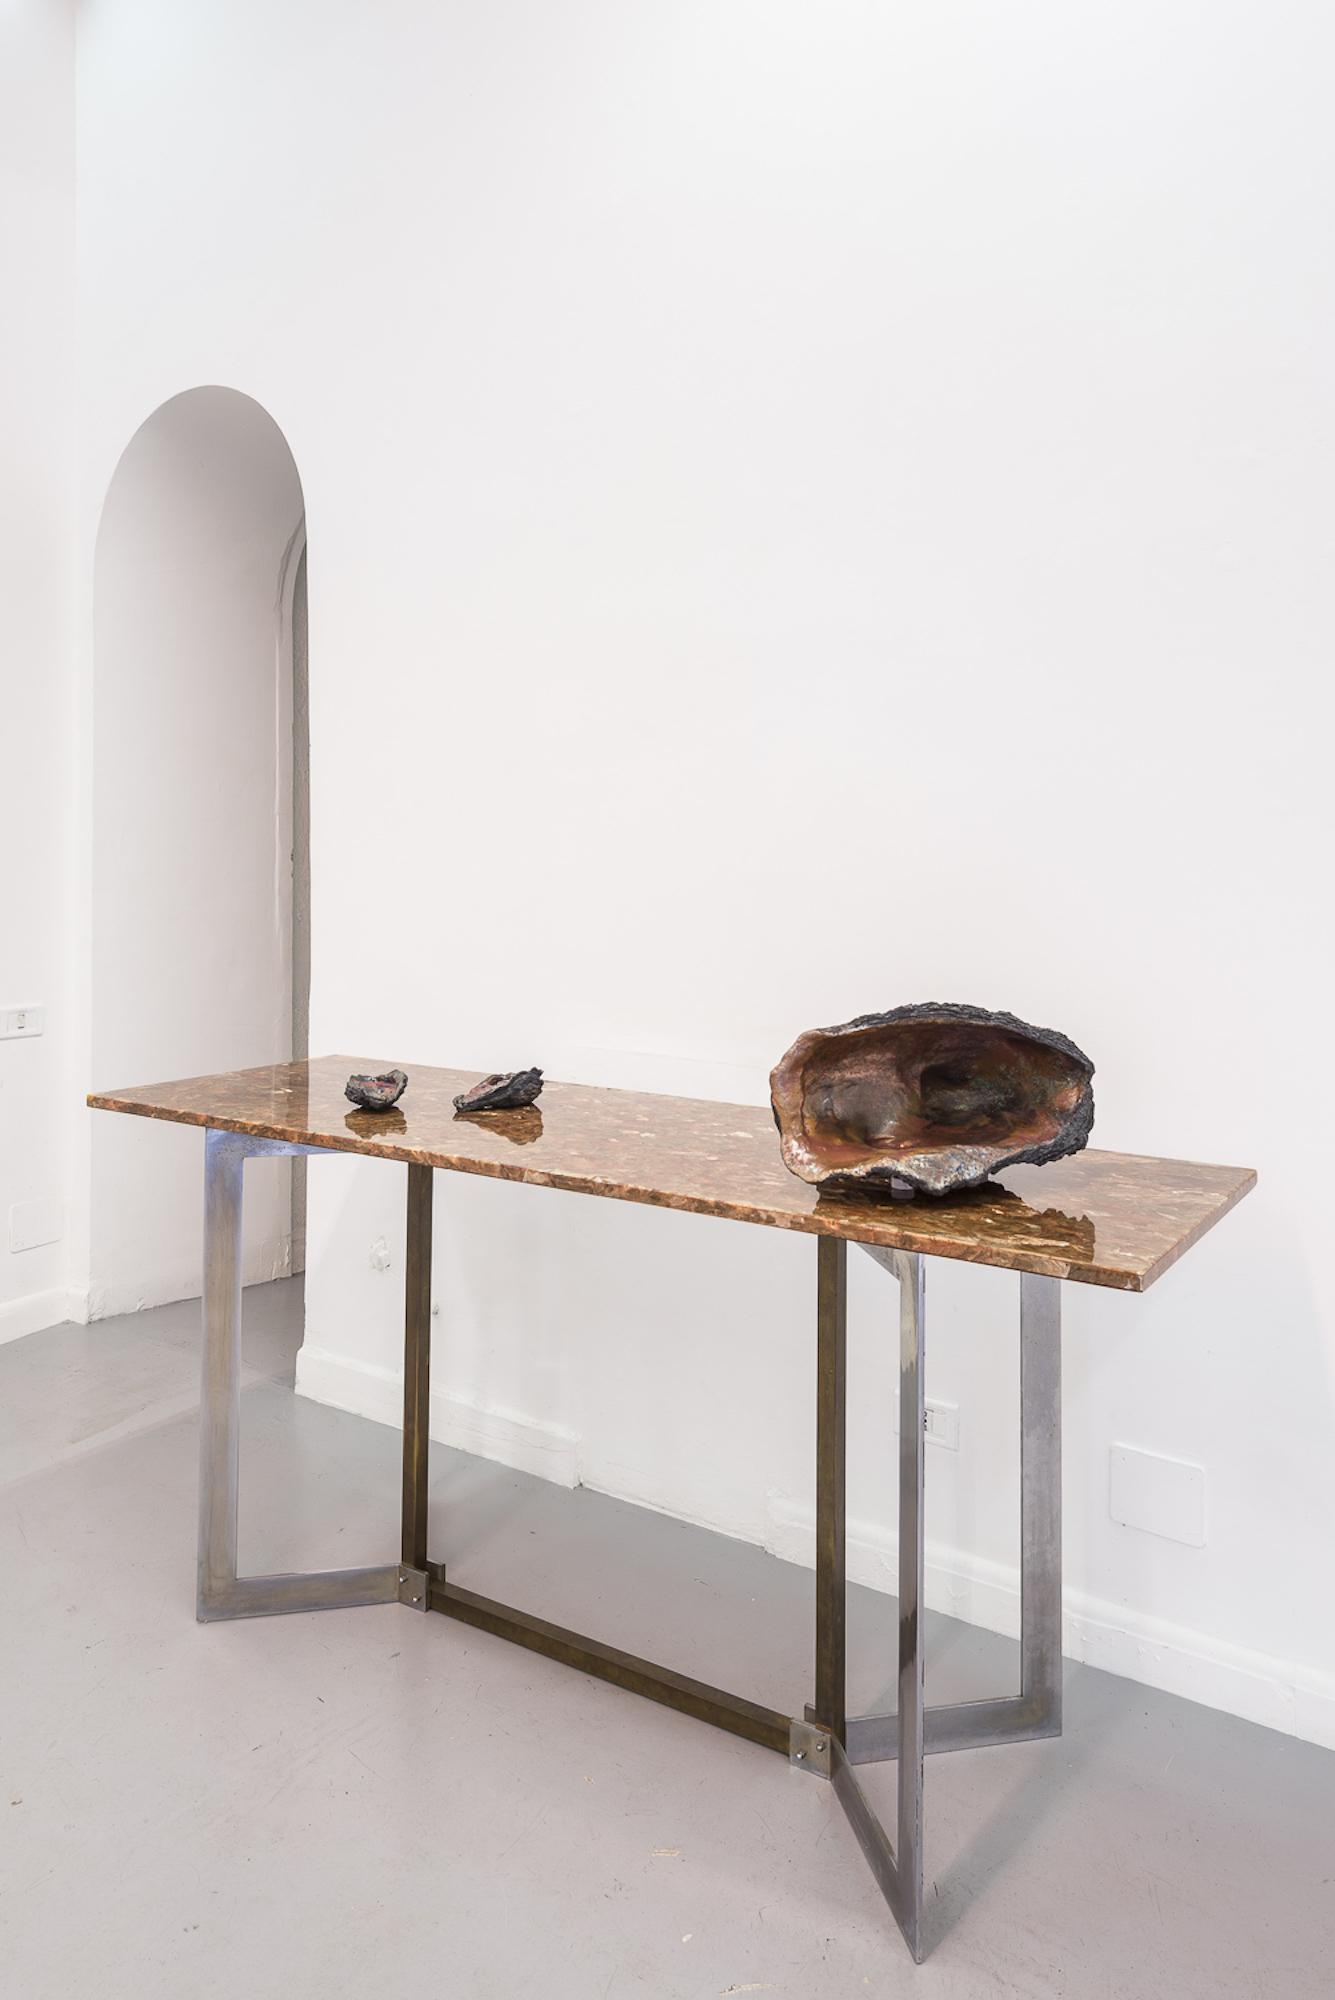 Cleo Fariselli, Dy Yiayi, Exhibition detail. Operativa, Rome. Photo Sebastiano Luciano. 1